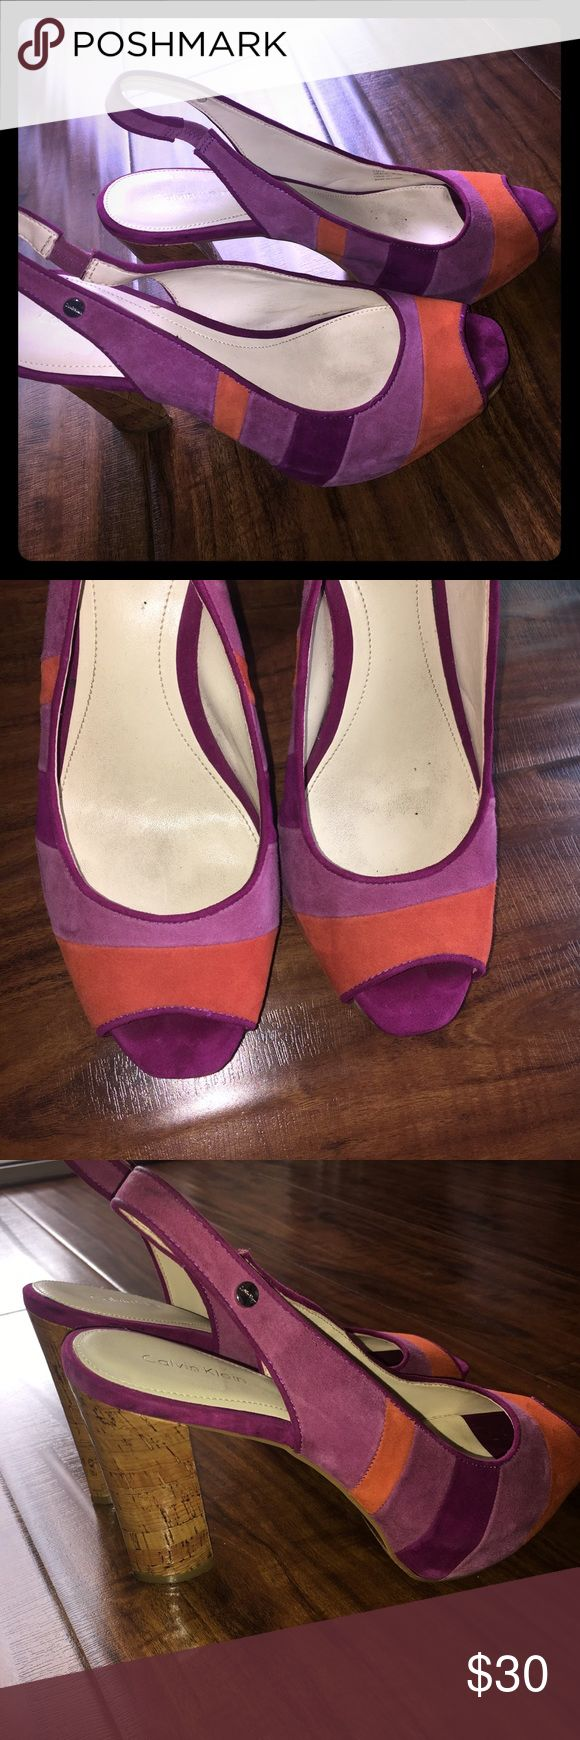 Calvin Klein sling back sandals Purple and orange suede sling back sandals. Size 9.5M Calvin Klein Shoes Sandals